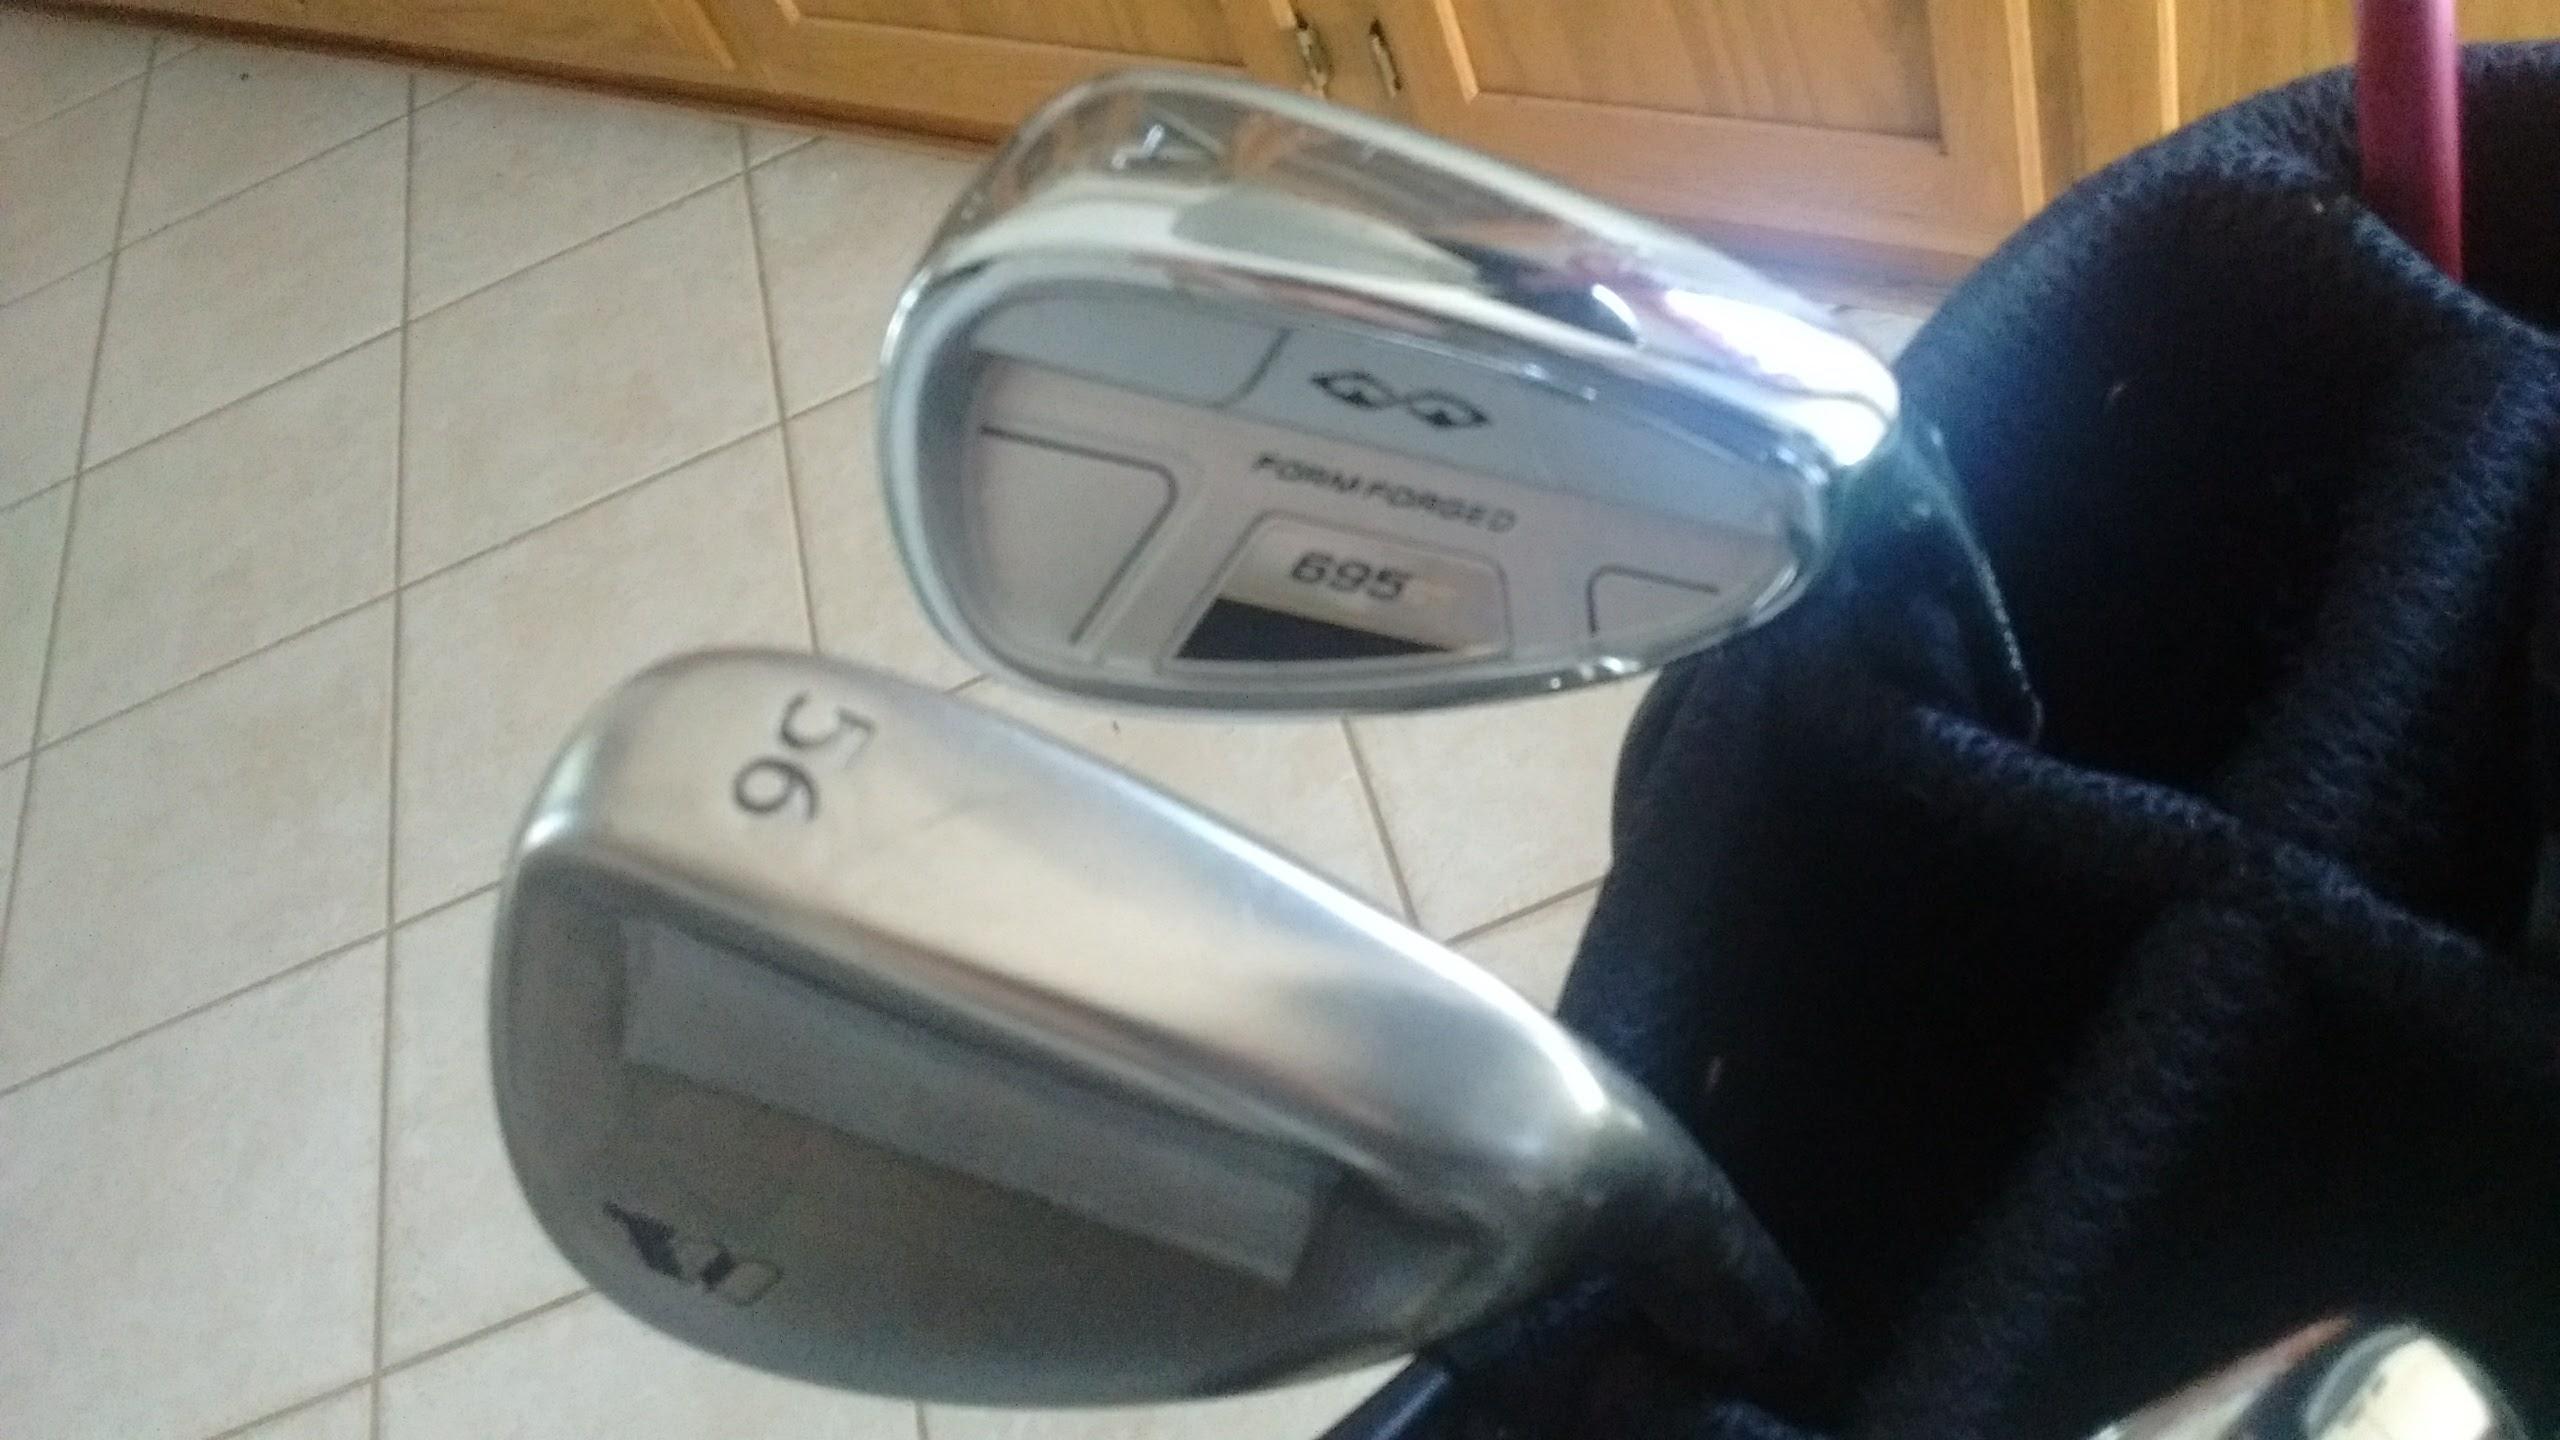 image http://www.golfbuzz.com/assets/images/108-DzIjuOfCTa1JZLhY.jpeg